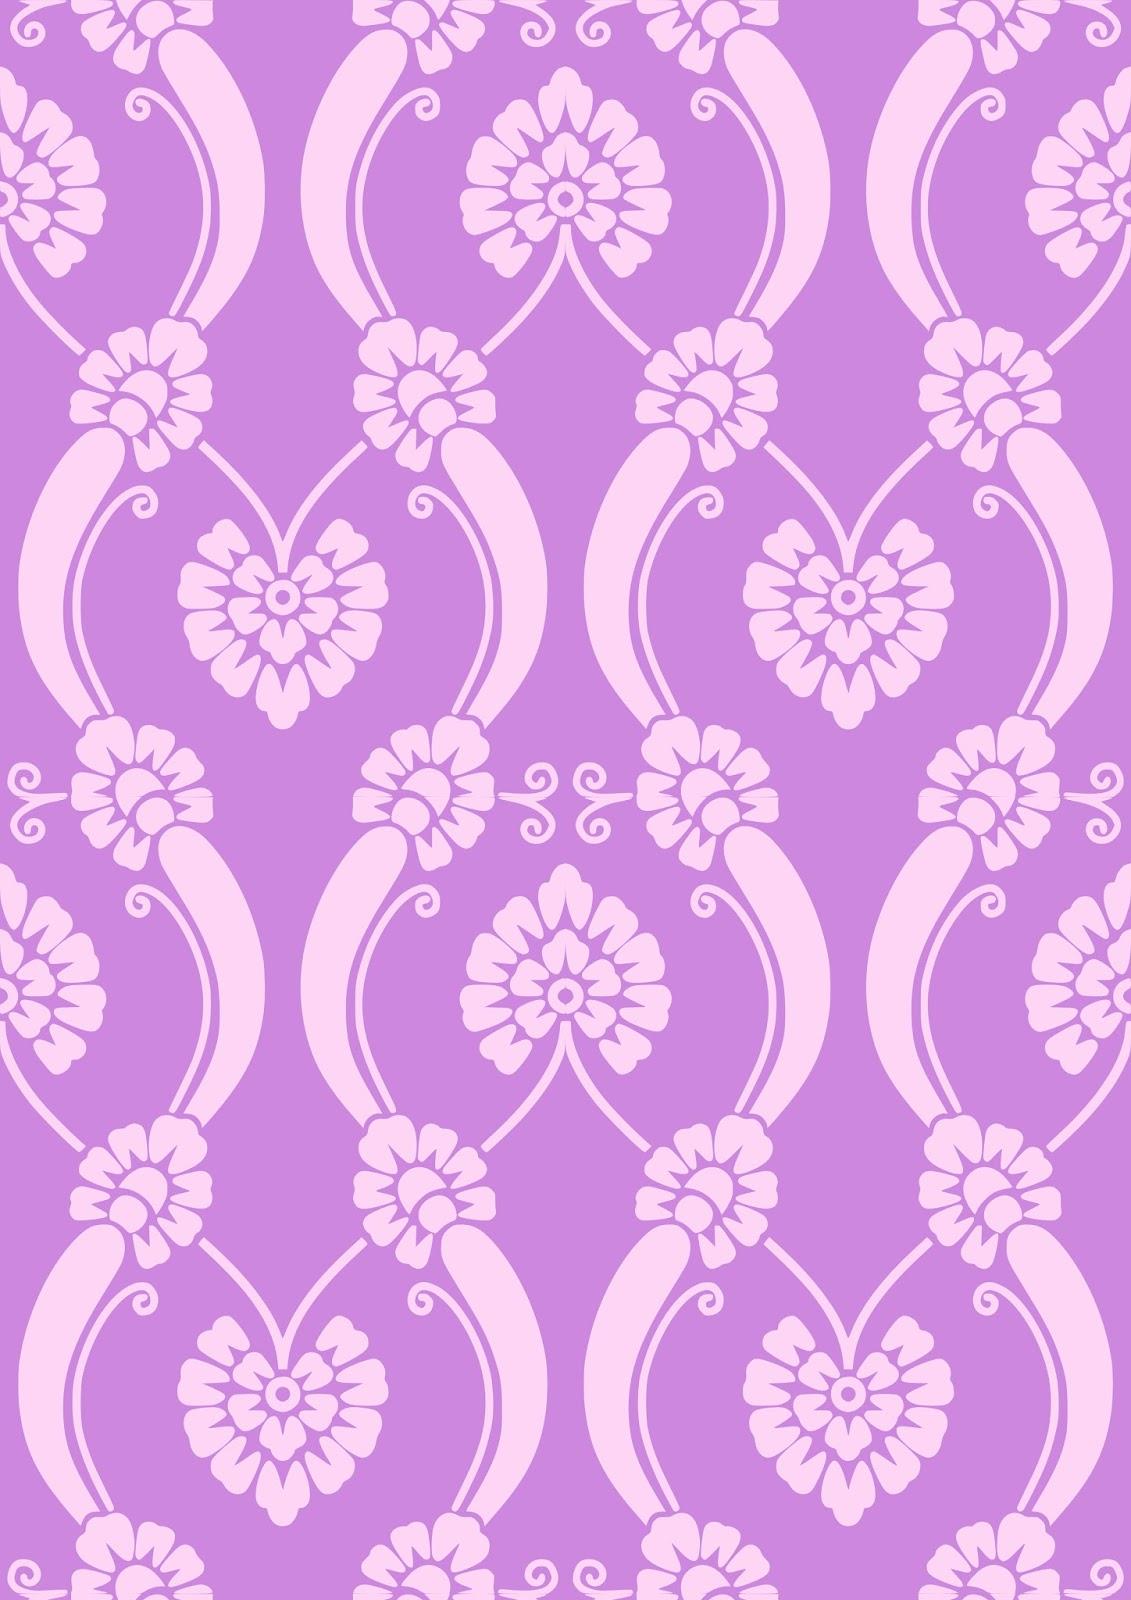 http://1.bp.blogspot.com/-Dt_vlCbqkw8/VSLgohhYkJI/AAAAAAAAih4/EVq5U2w5sV8/s1600/lilac_ornament_paper_A4.jpg